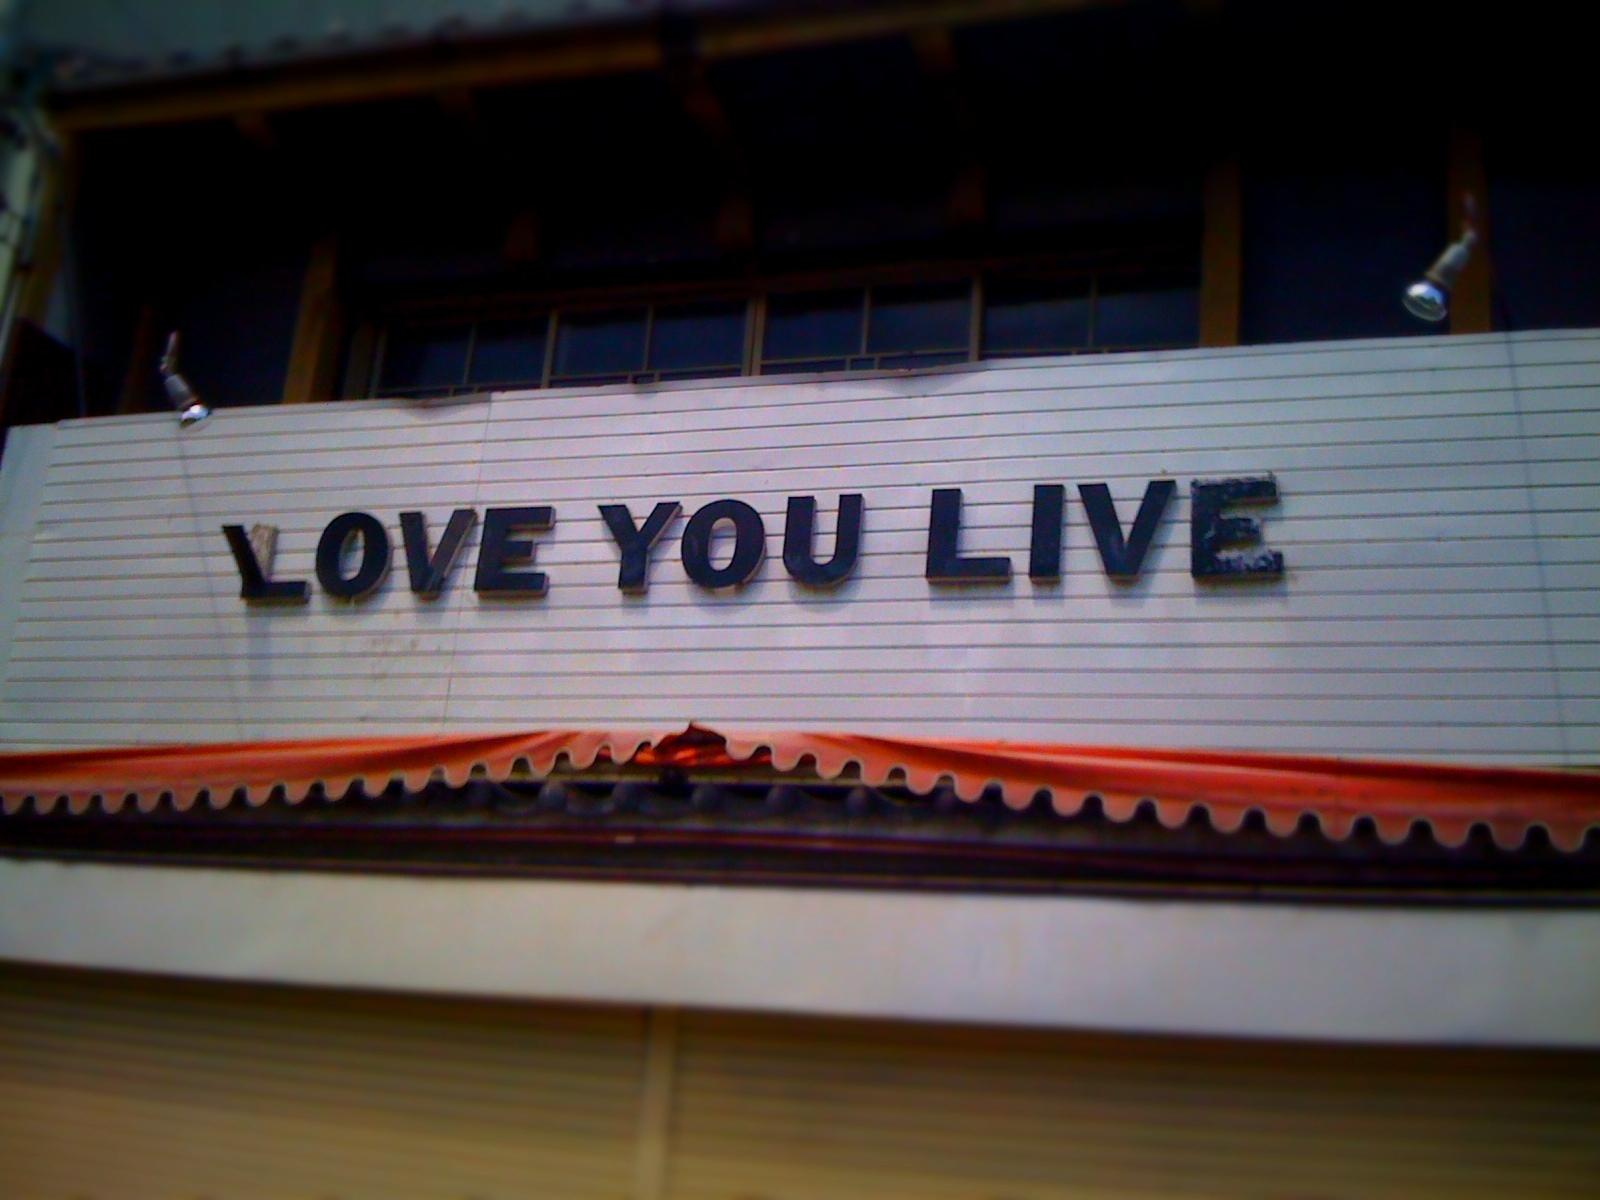 Engrish message